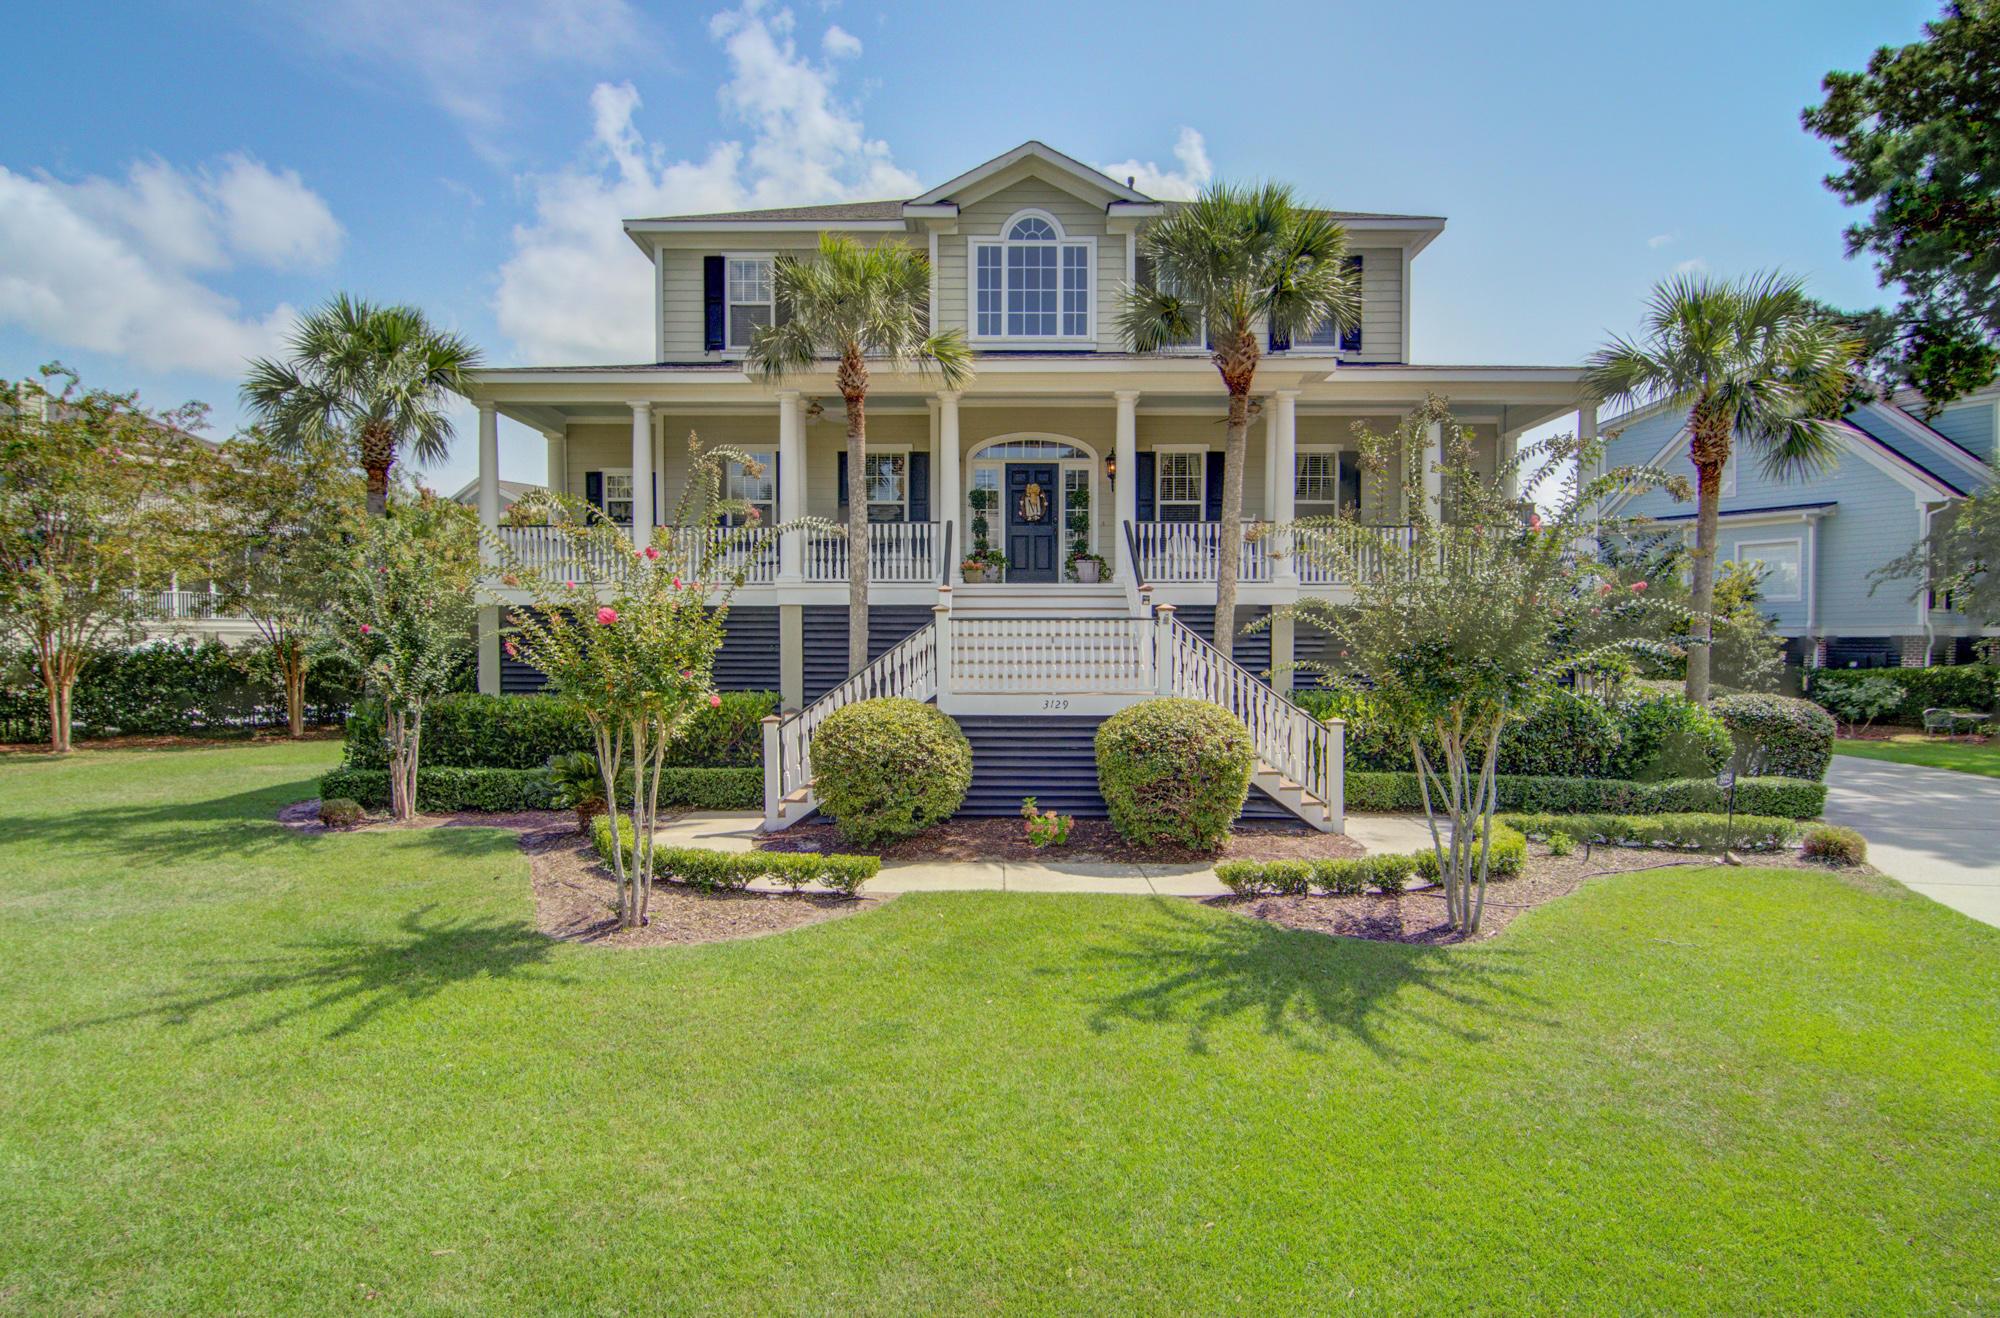 Hamlin Plantation Homes For Sale - 3129 Sand Marsh, Mount Pleasant, SC - 23